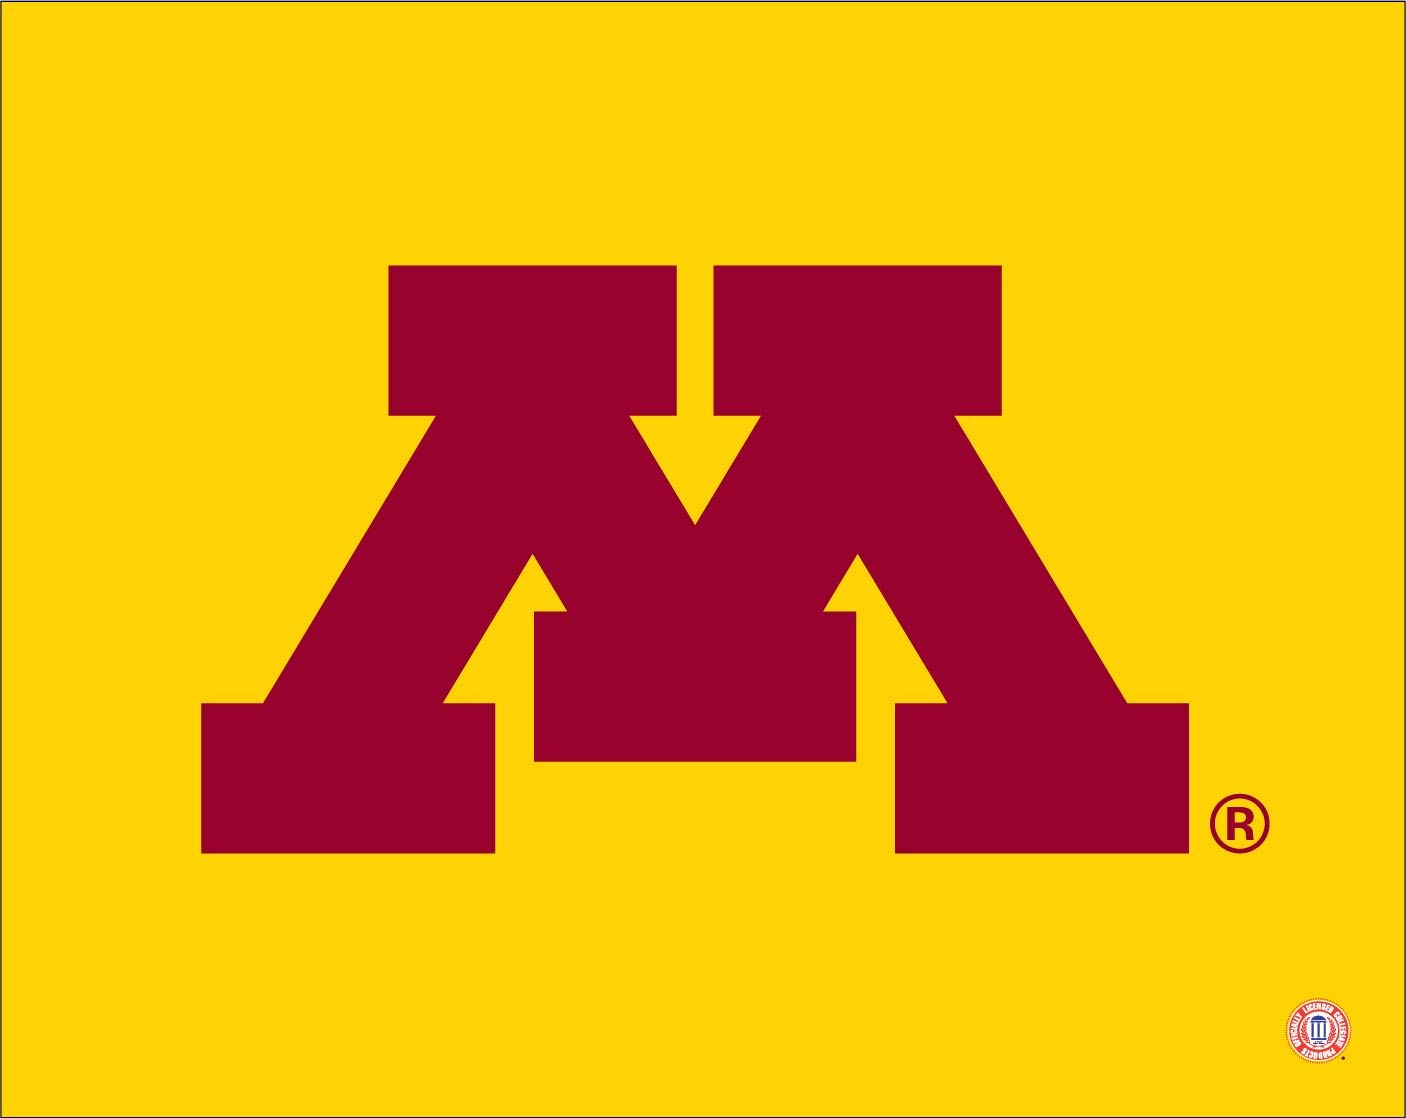 Minnesota Gophers my favorite college basketball team.